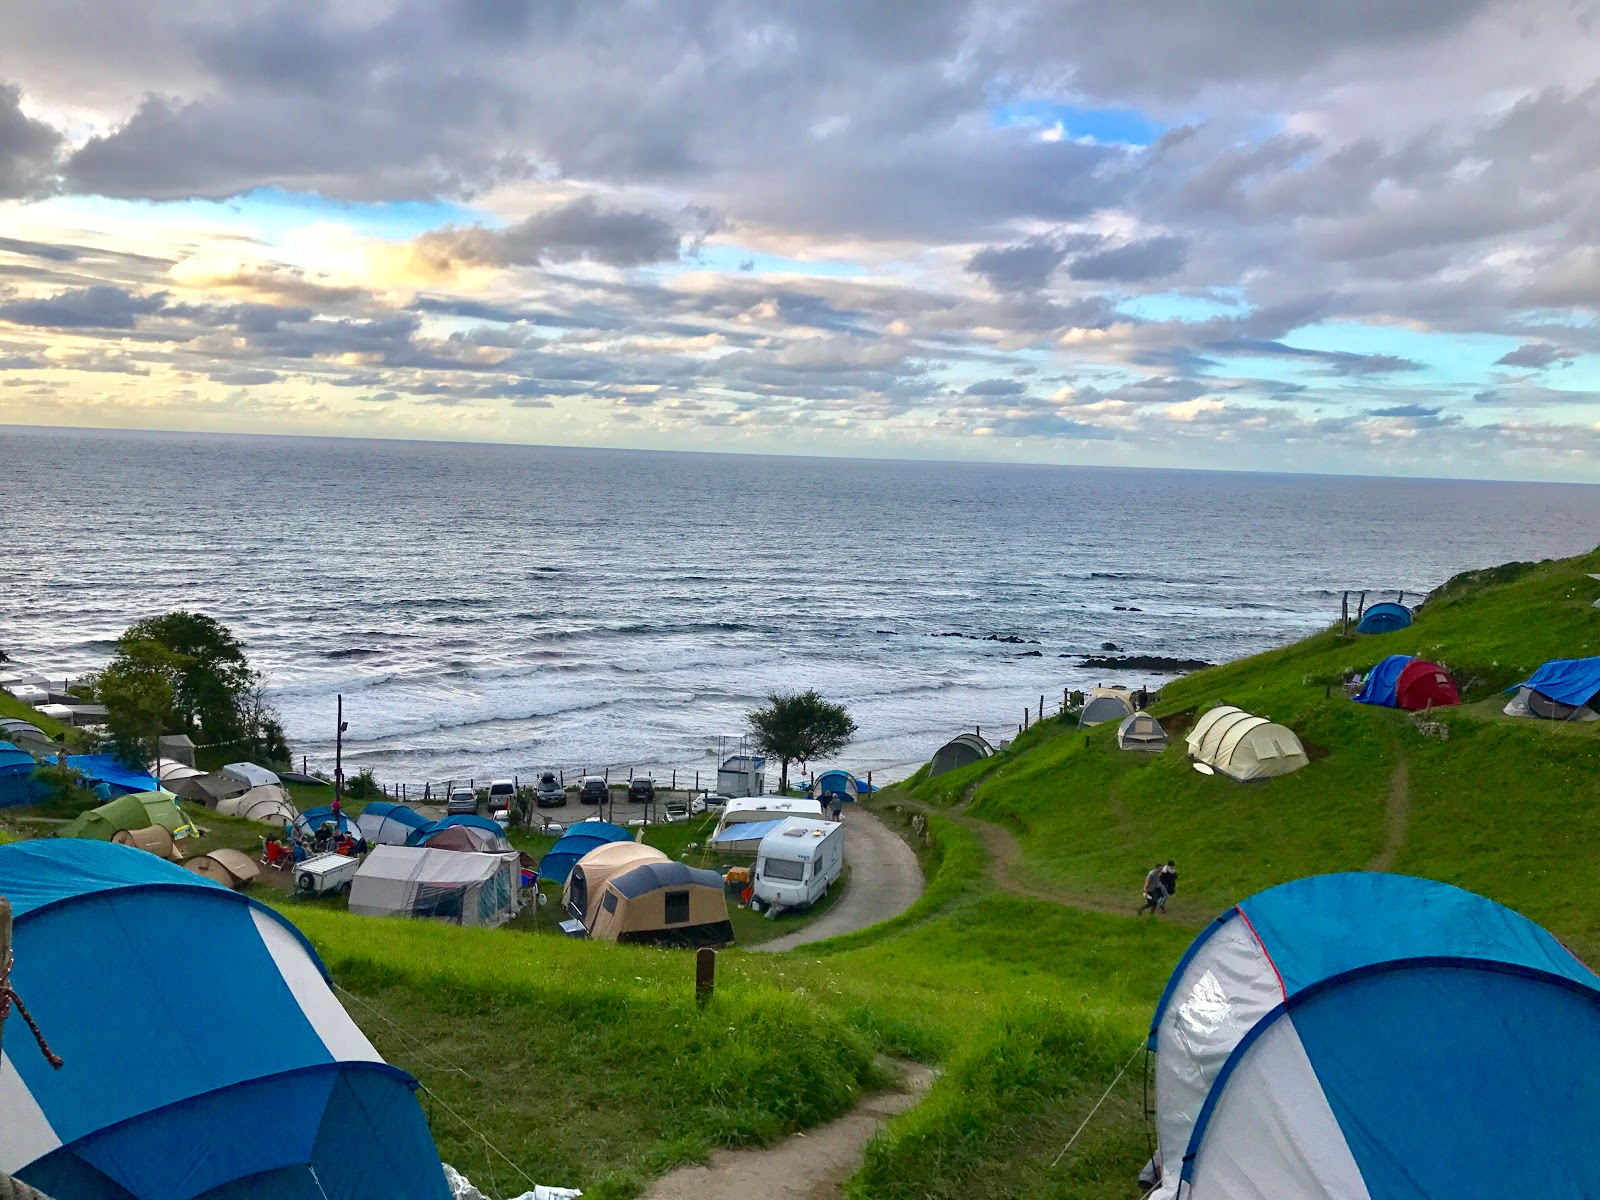 Kamping la Paz nad Zatoką biskajską - MOTO EURO TRIP 2017: Z UK NA GIBRALTAR - DZIEŃ 11/13